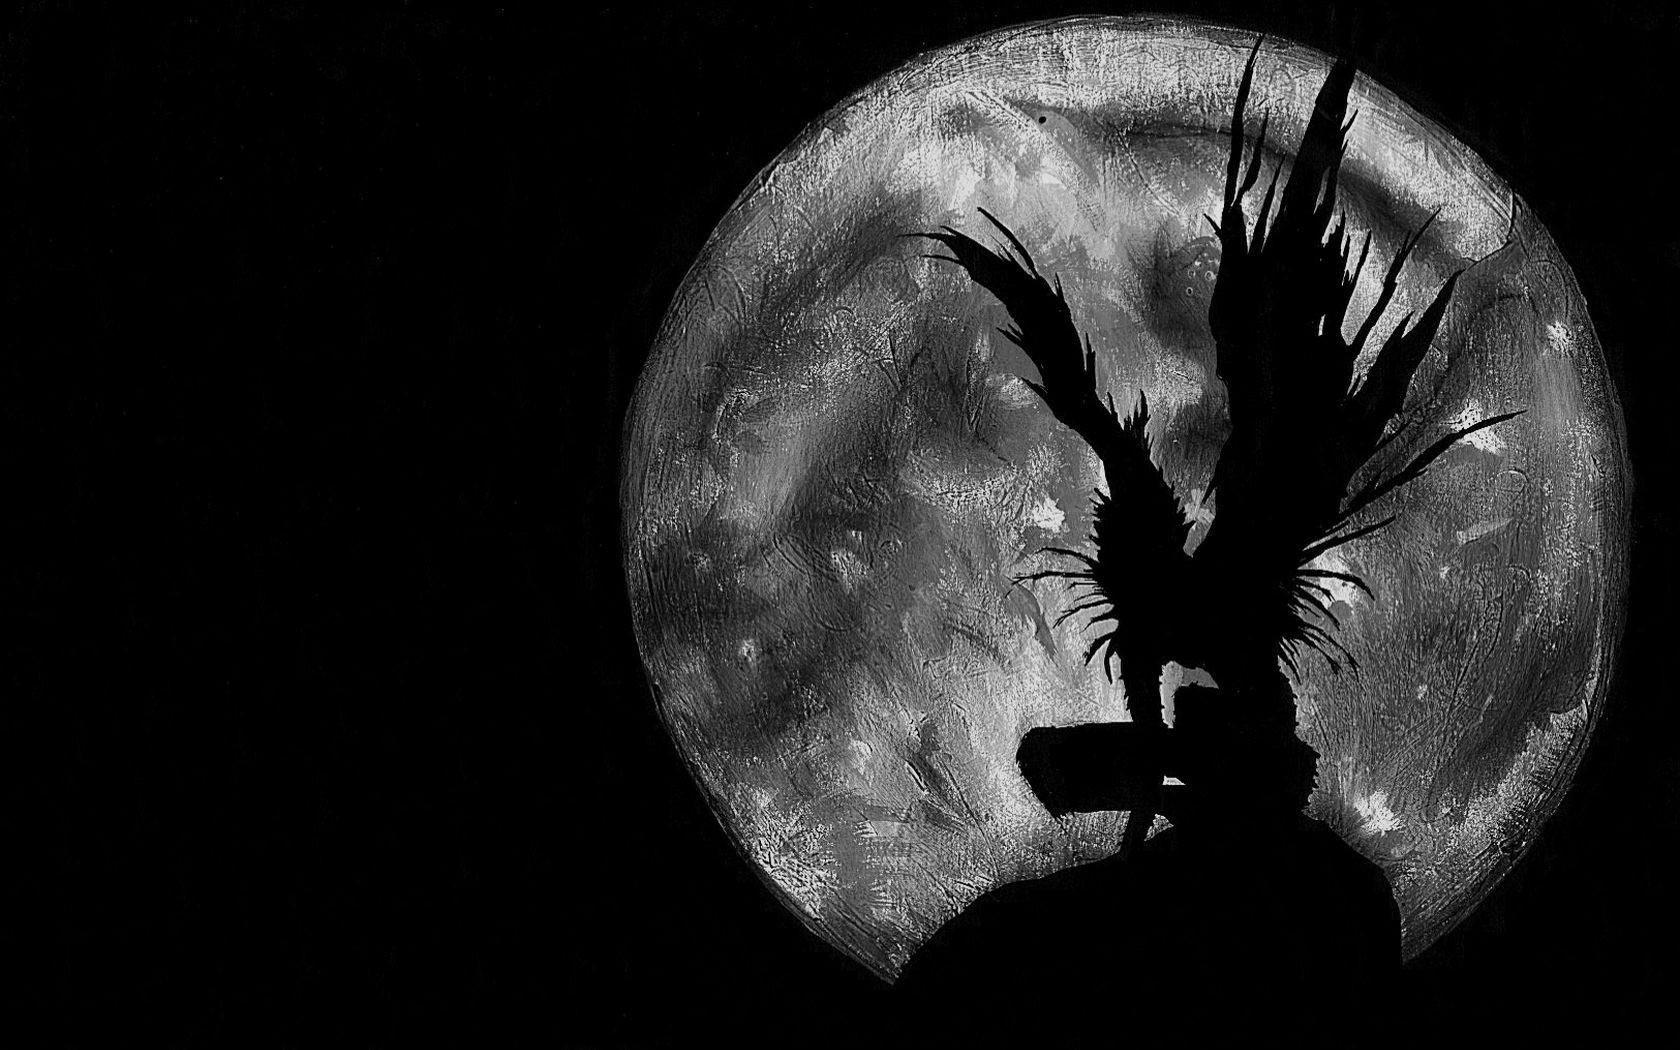 Wallpaper : Moon, circle, Death Note, Ryuk, head, eye ...